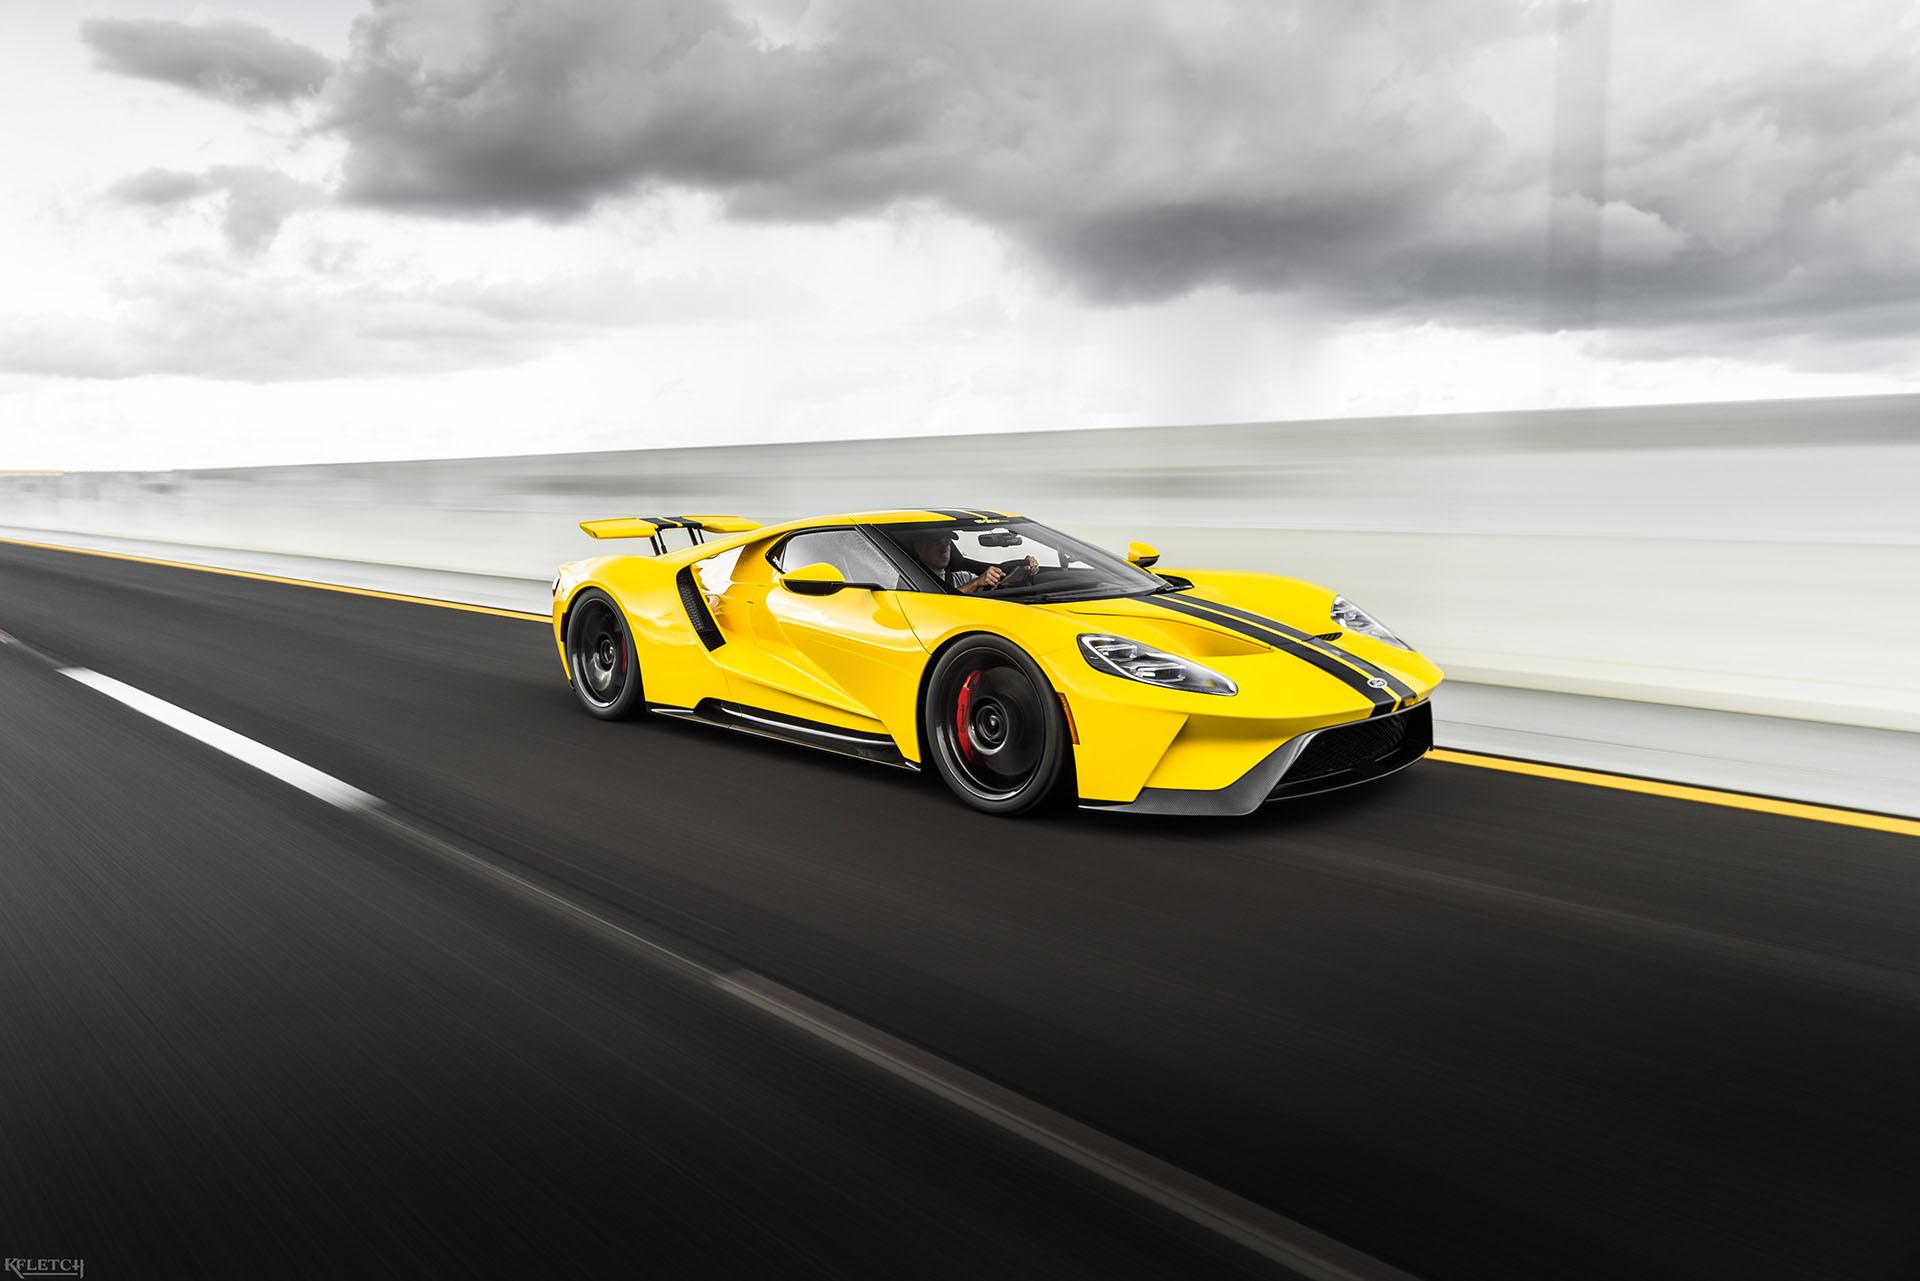 2018-Ford-GT-DragtTimes-rolling-01.jpg